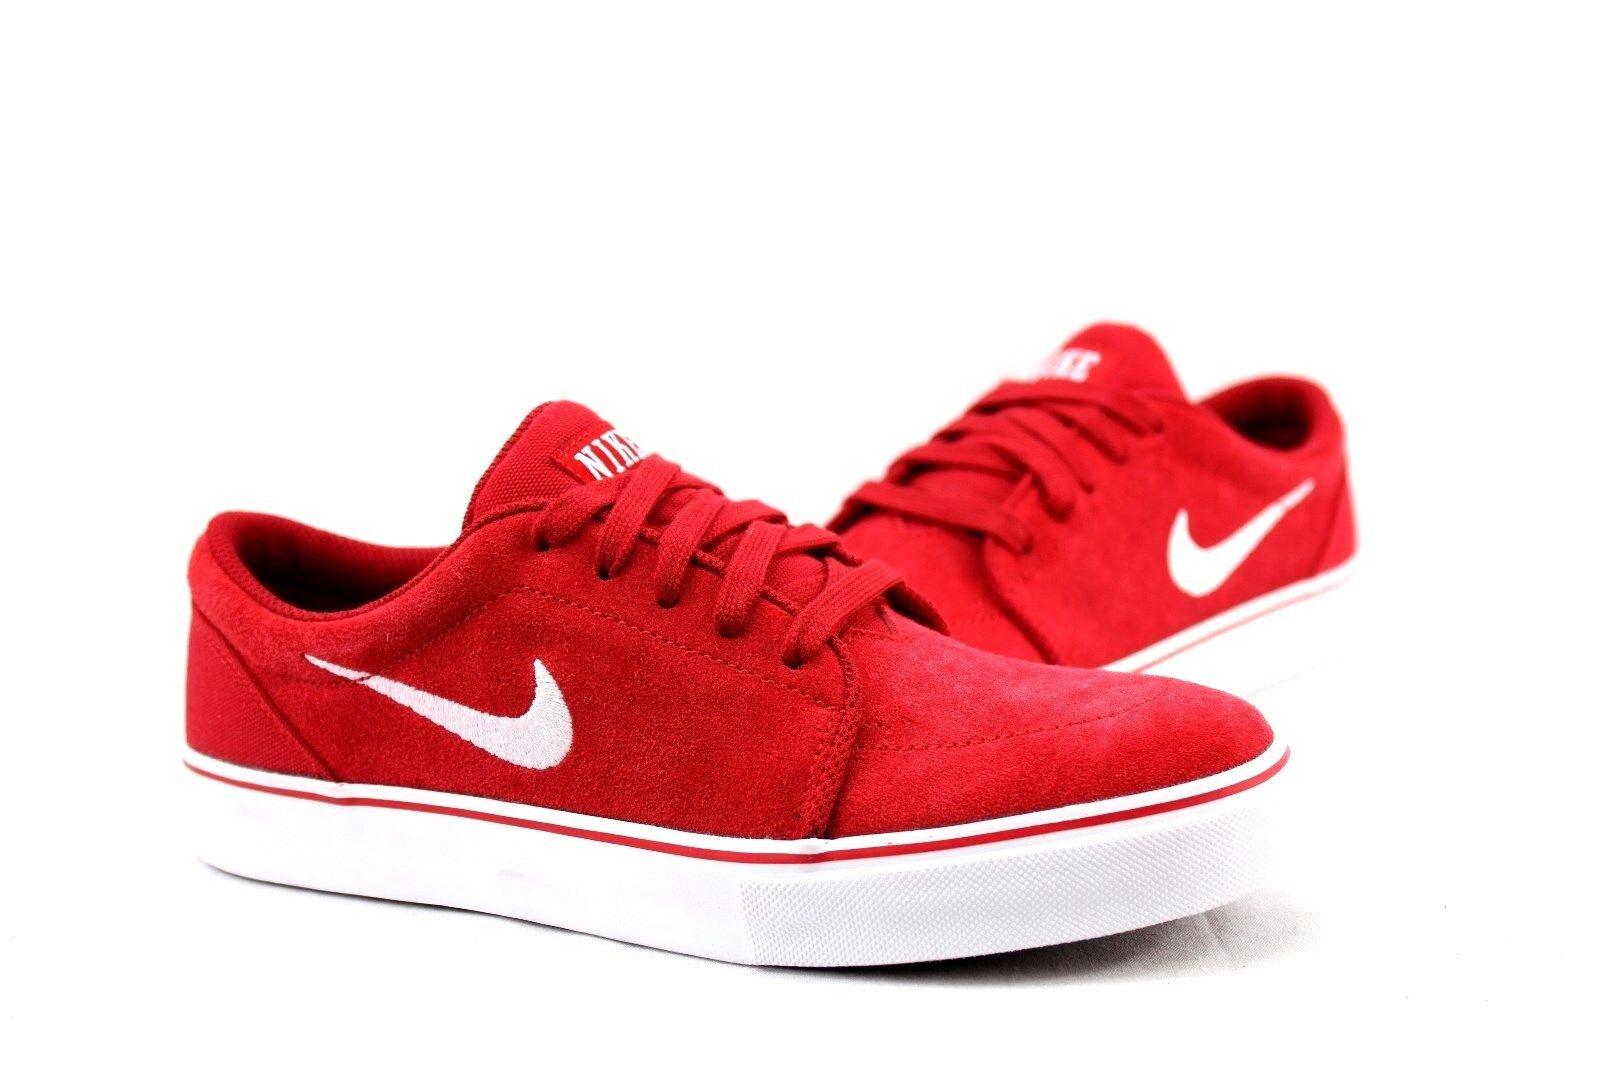 Nike SB Satire 536404-610 GYM RED/WHITE Size: 7